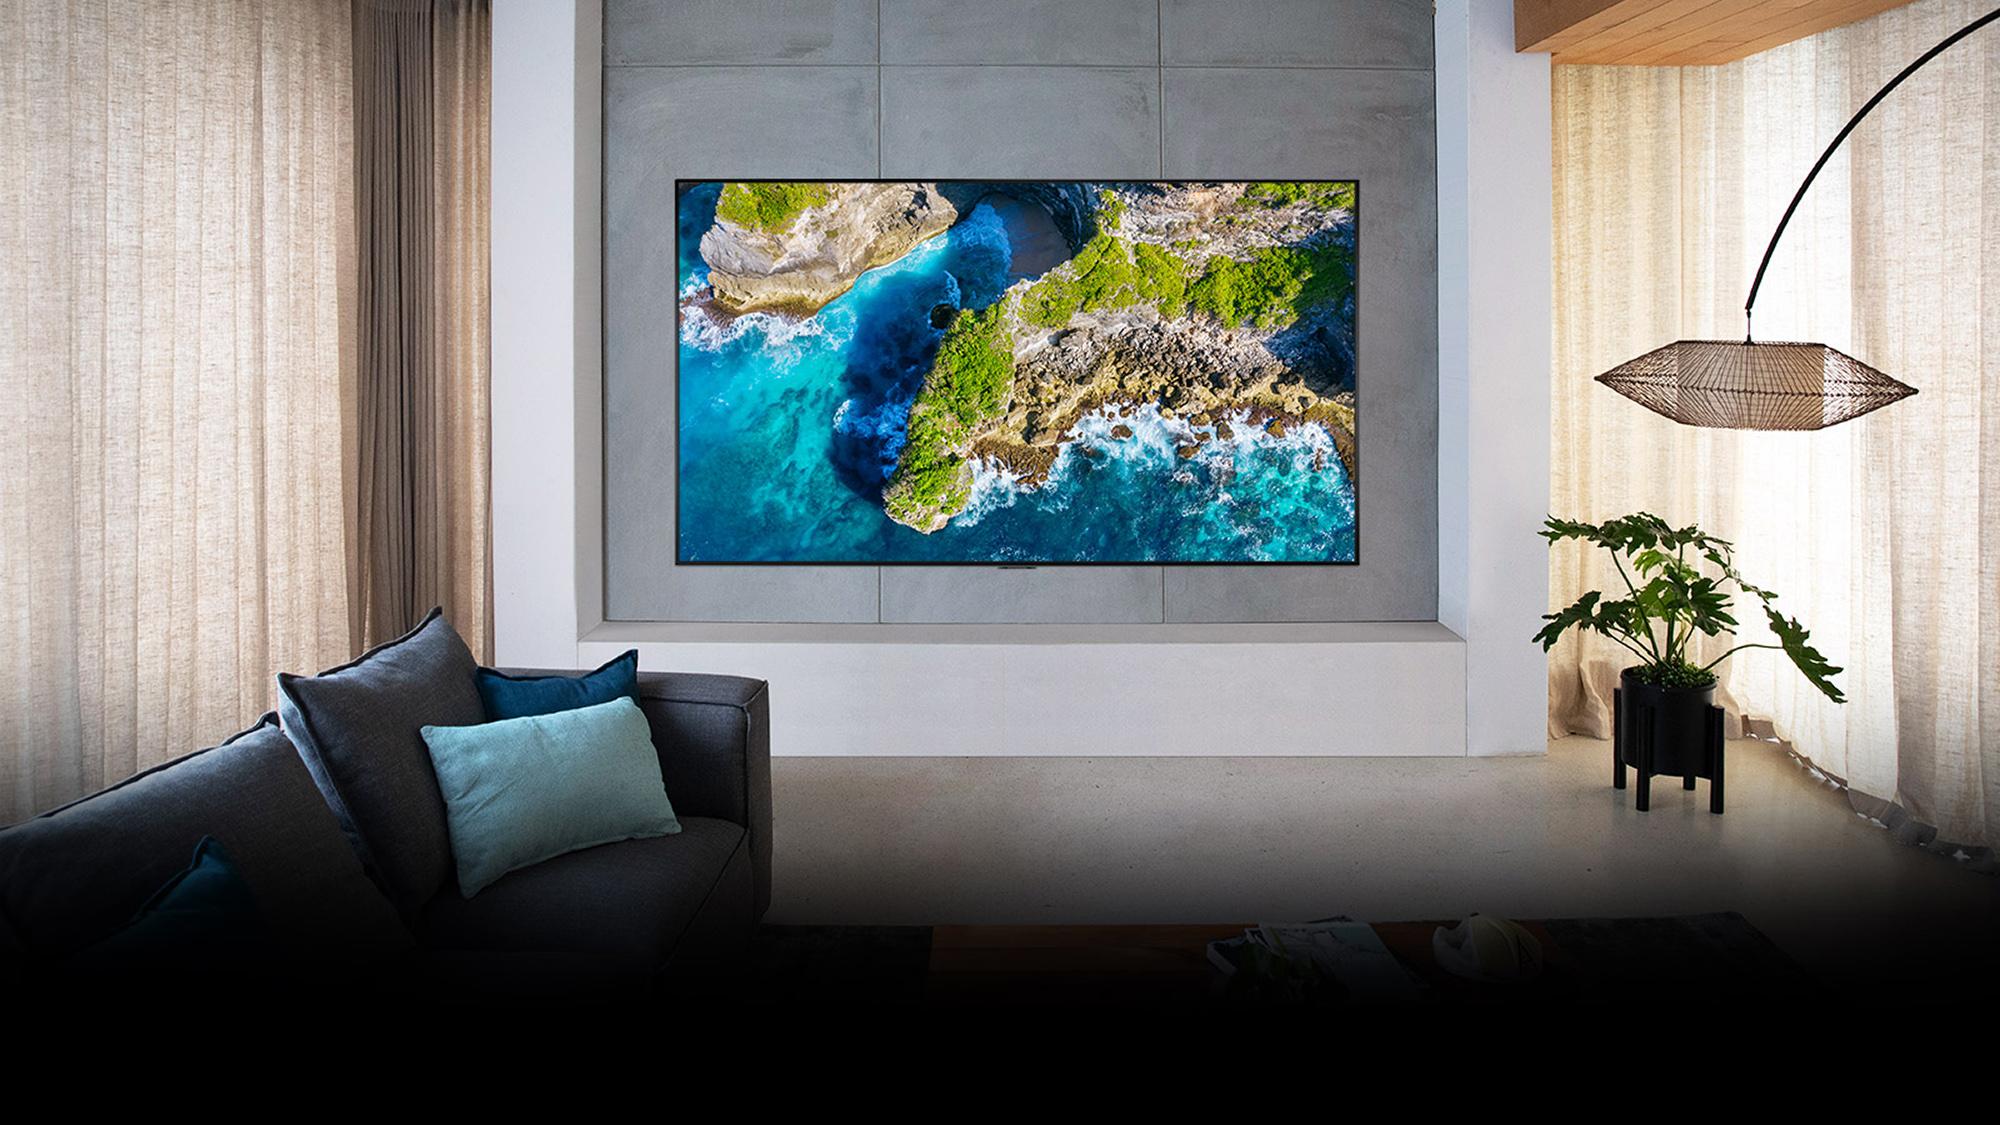 Best OLED TVs: LG GX OLED TV review